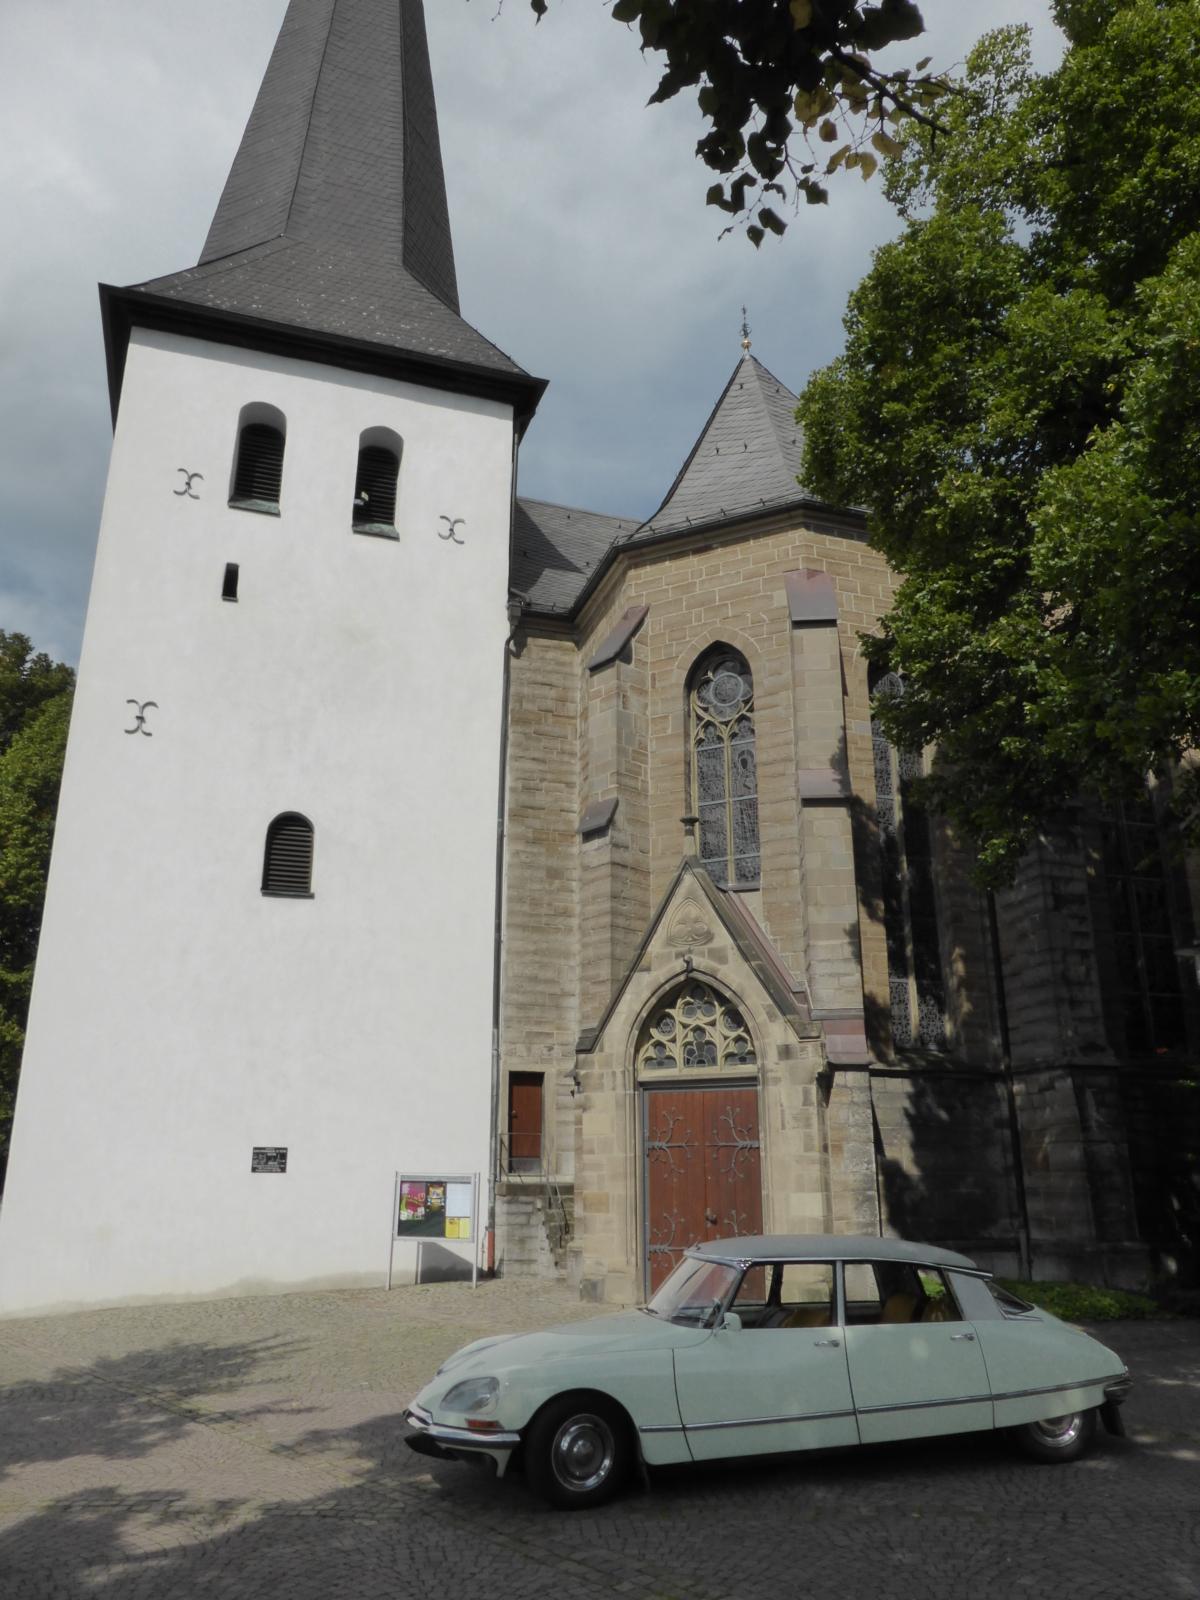 St. Petri, Hüsten